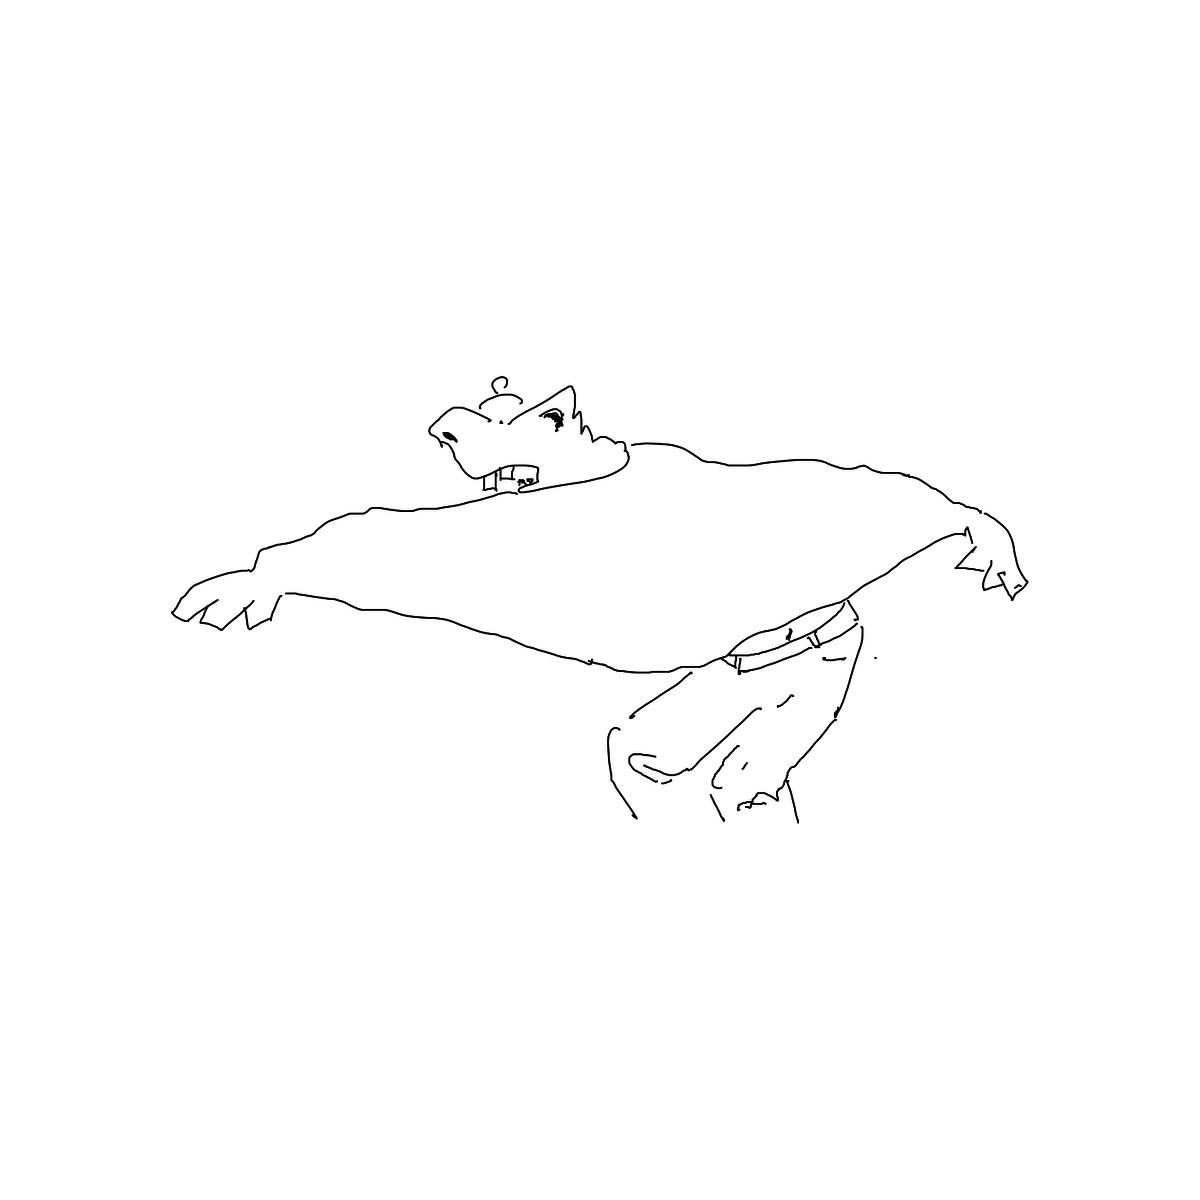 BAAAM drawing#16559 lat:51.4826660156250000lng: 15.1899547576904300